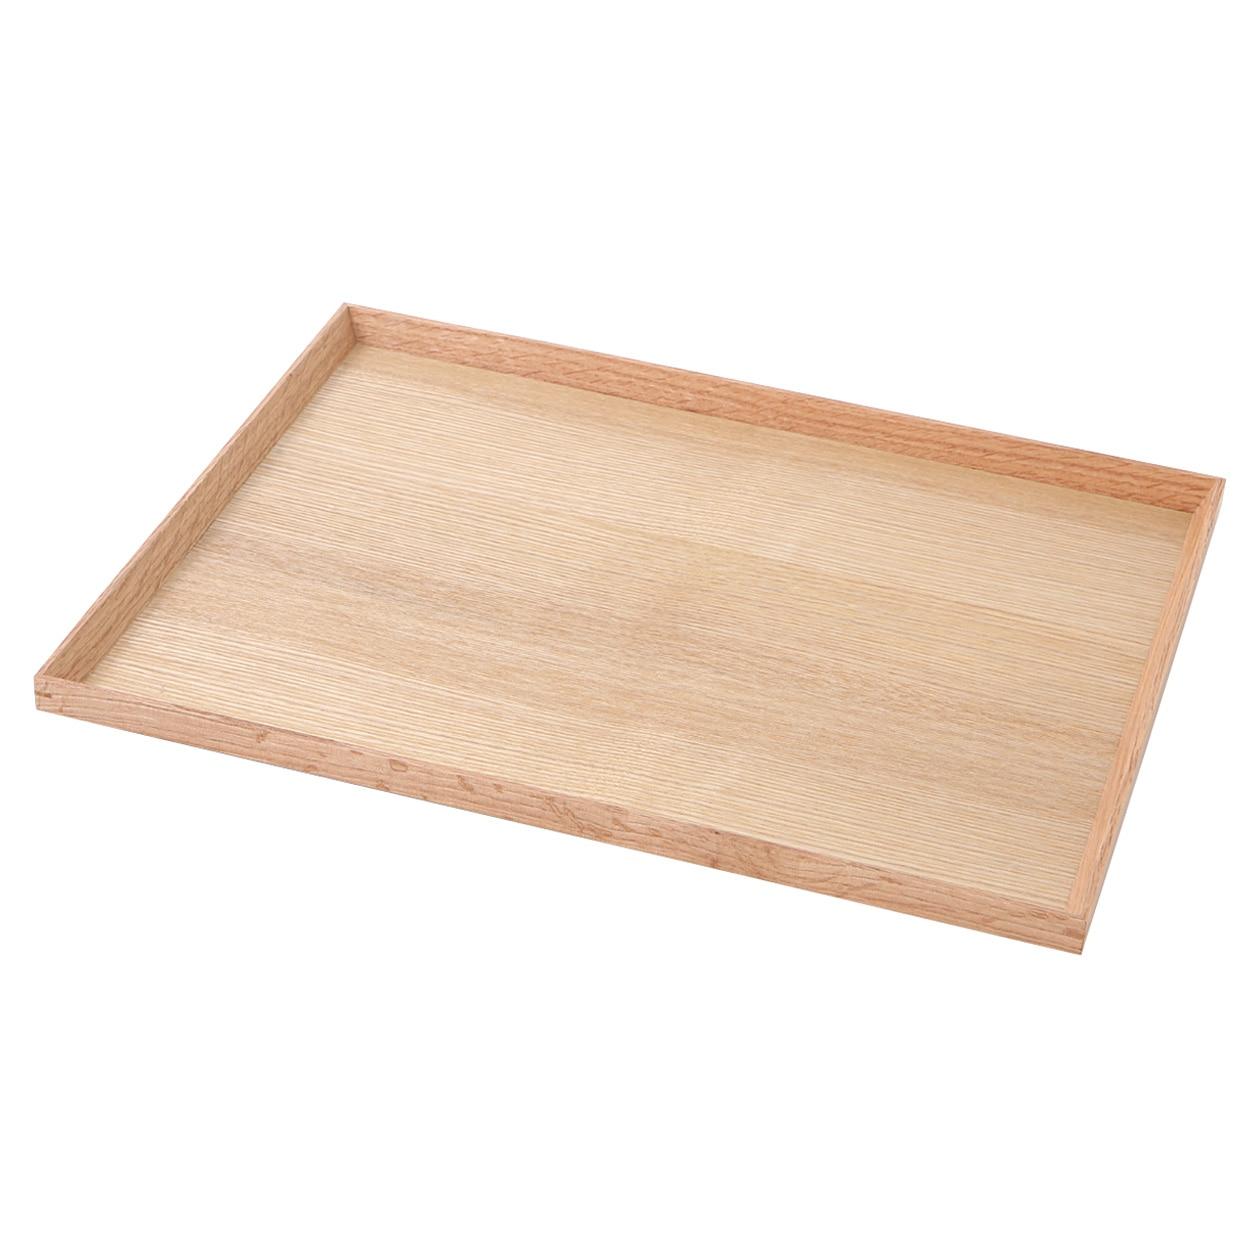 RoomClip商品情報 - 木製 角型トレー